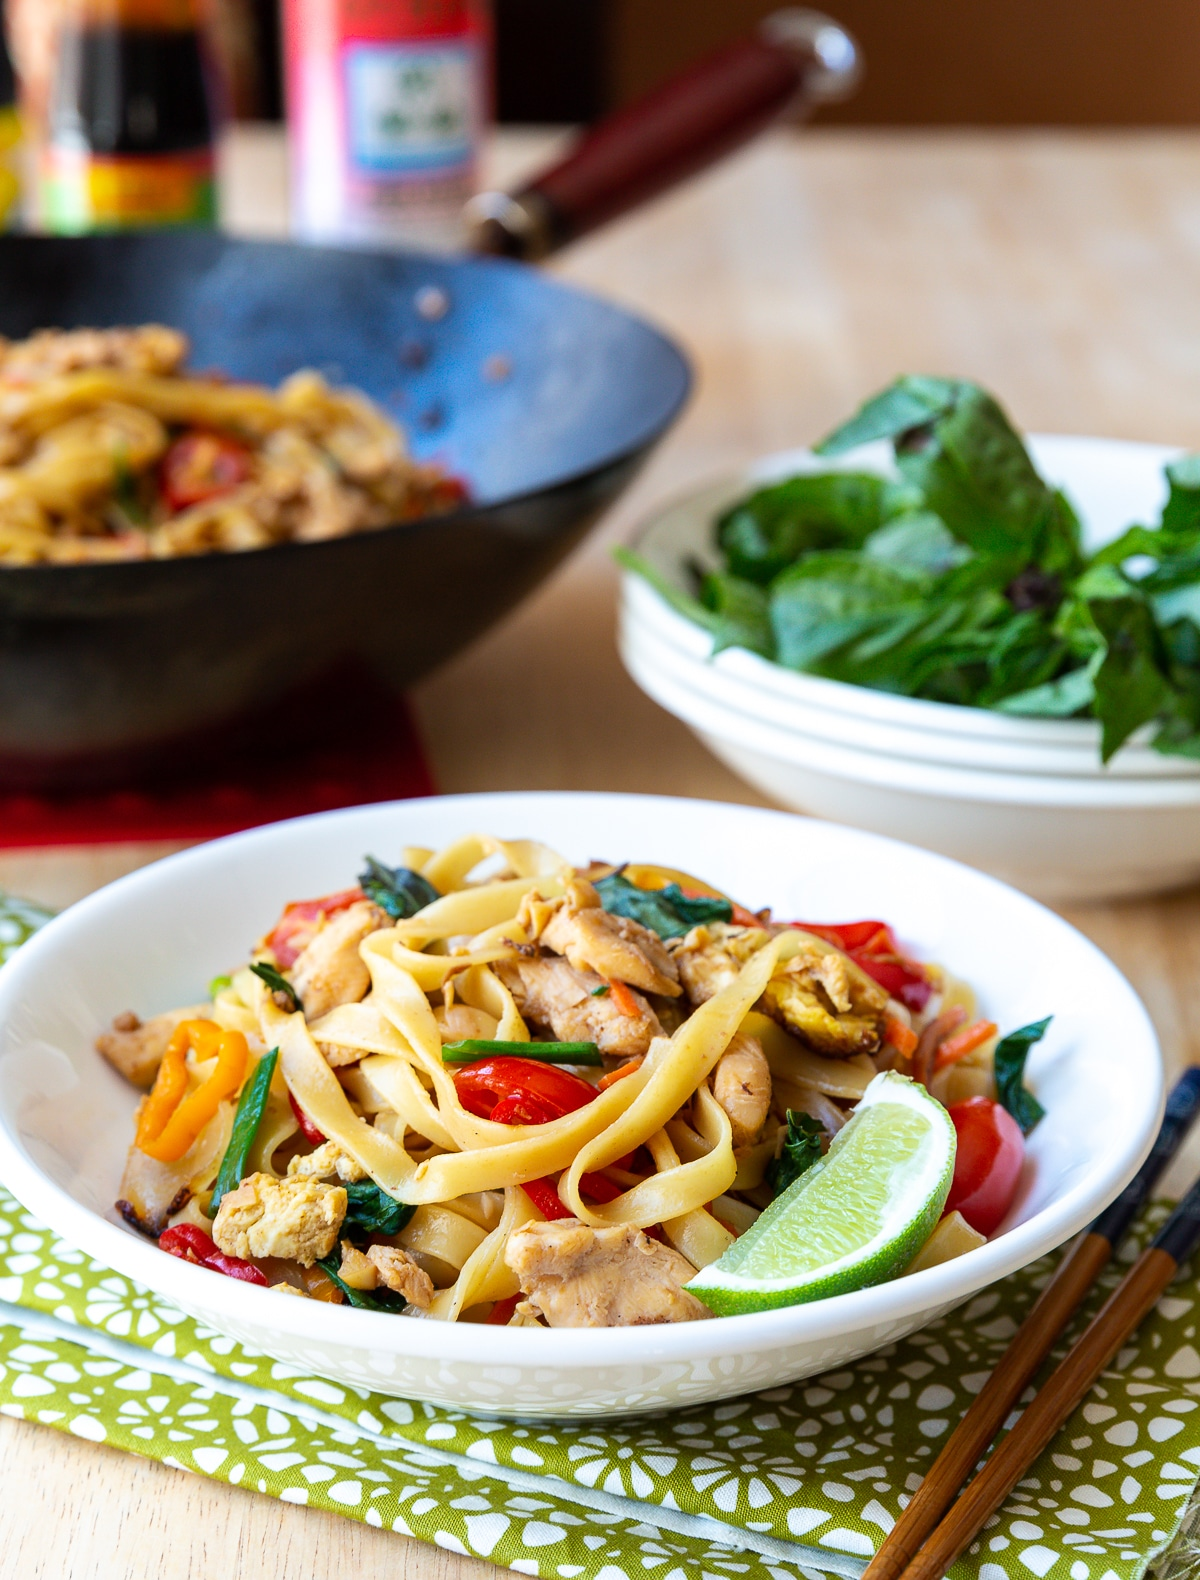 Pad Kee Mao Recipe (Drunken Noodles) #ASpicyPerspective #Thai #Recipe #Noodles #Wok